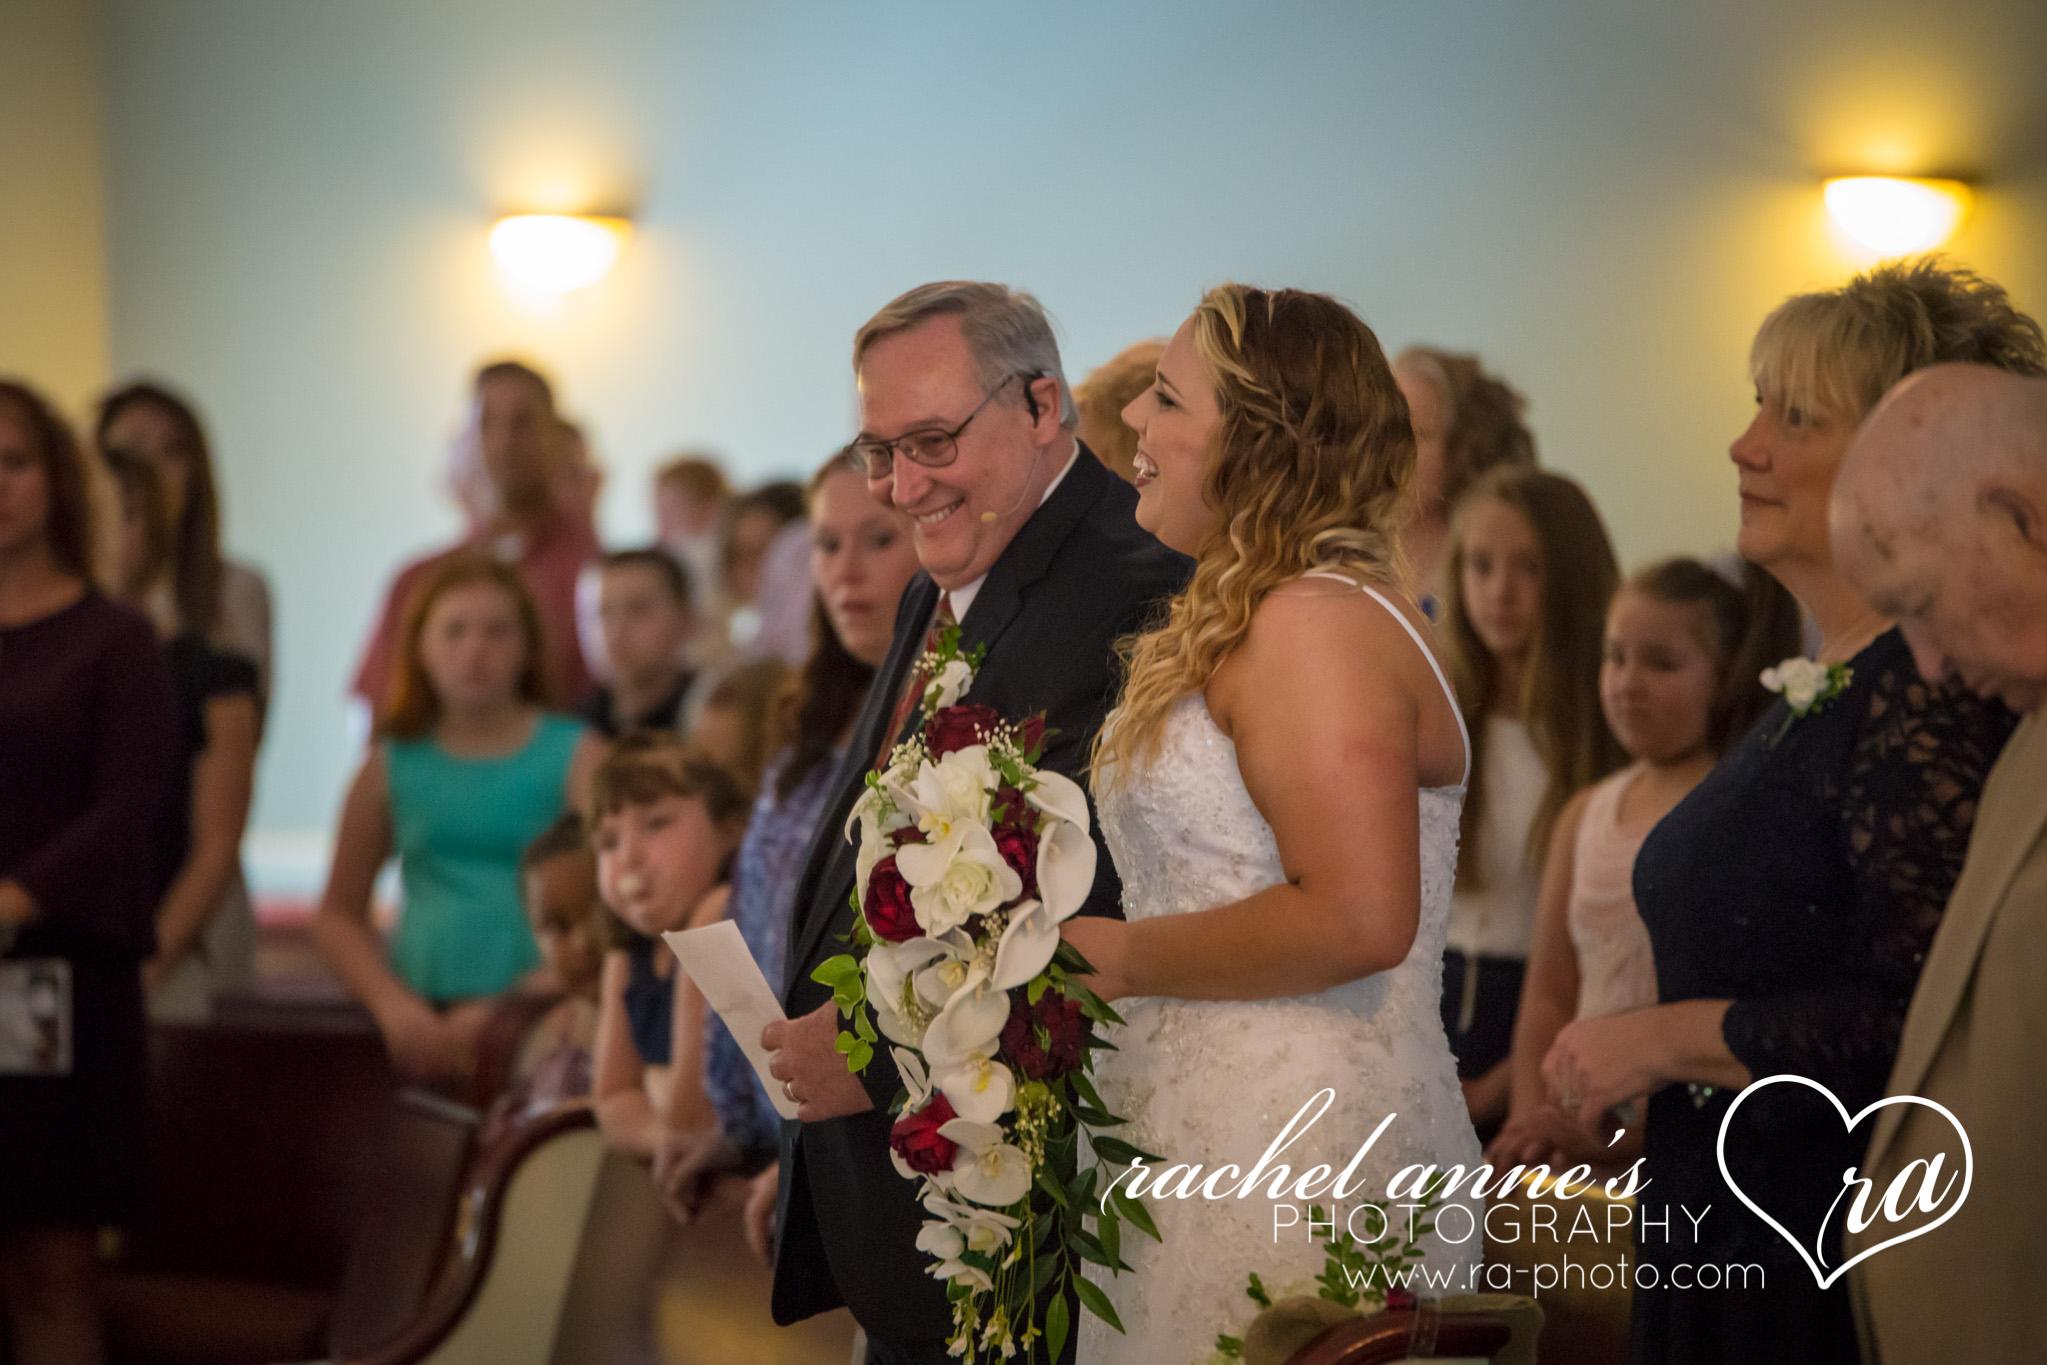 027-MAB-TREASURE-LAKE-CHURCH-LODGE-PA-WEDDINGS.jpg